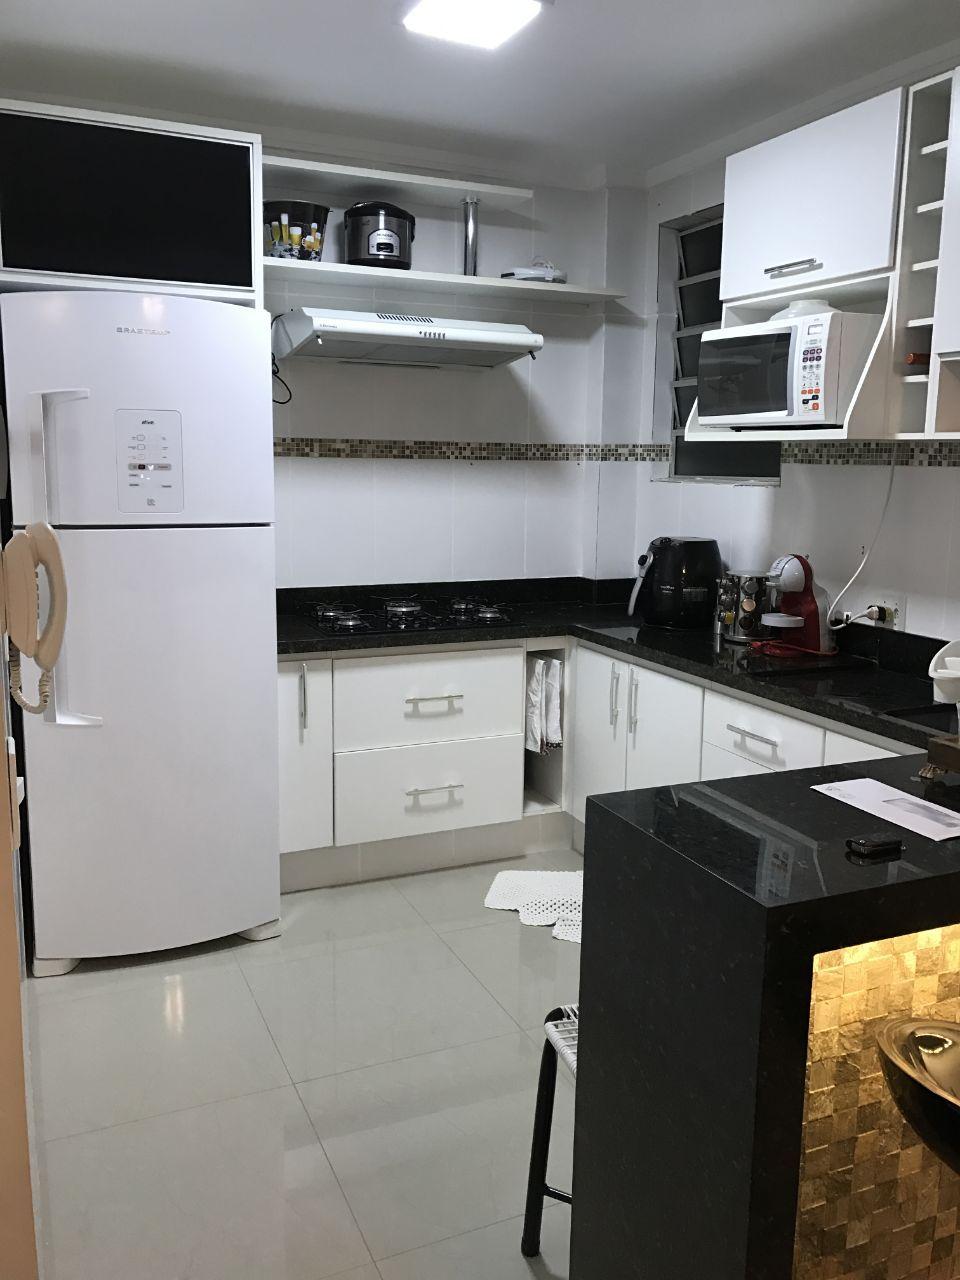 301 - Cobertura Duplex Jardim República VENDIDO